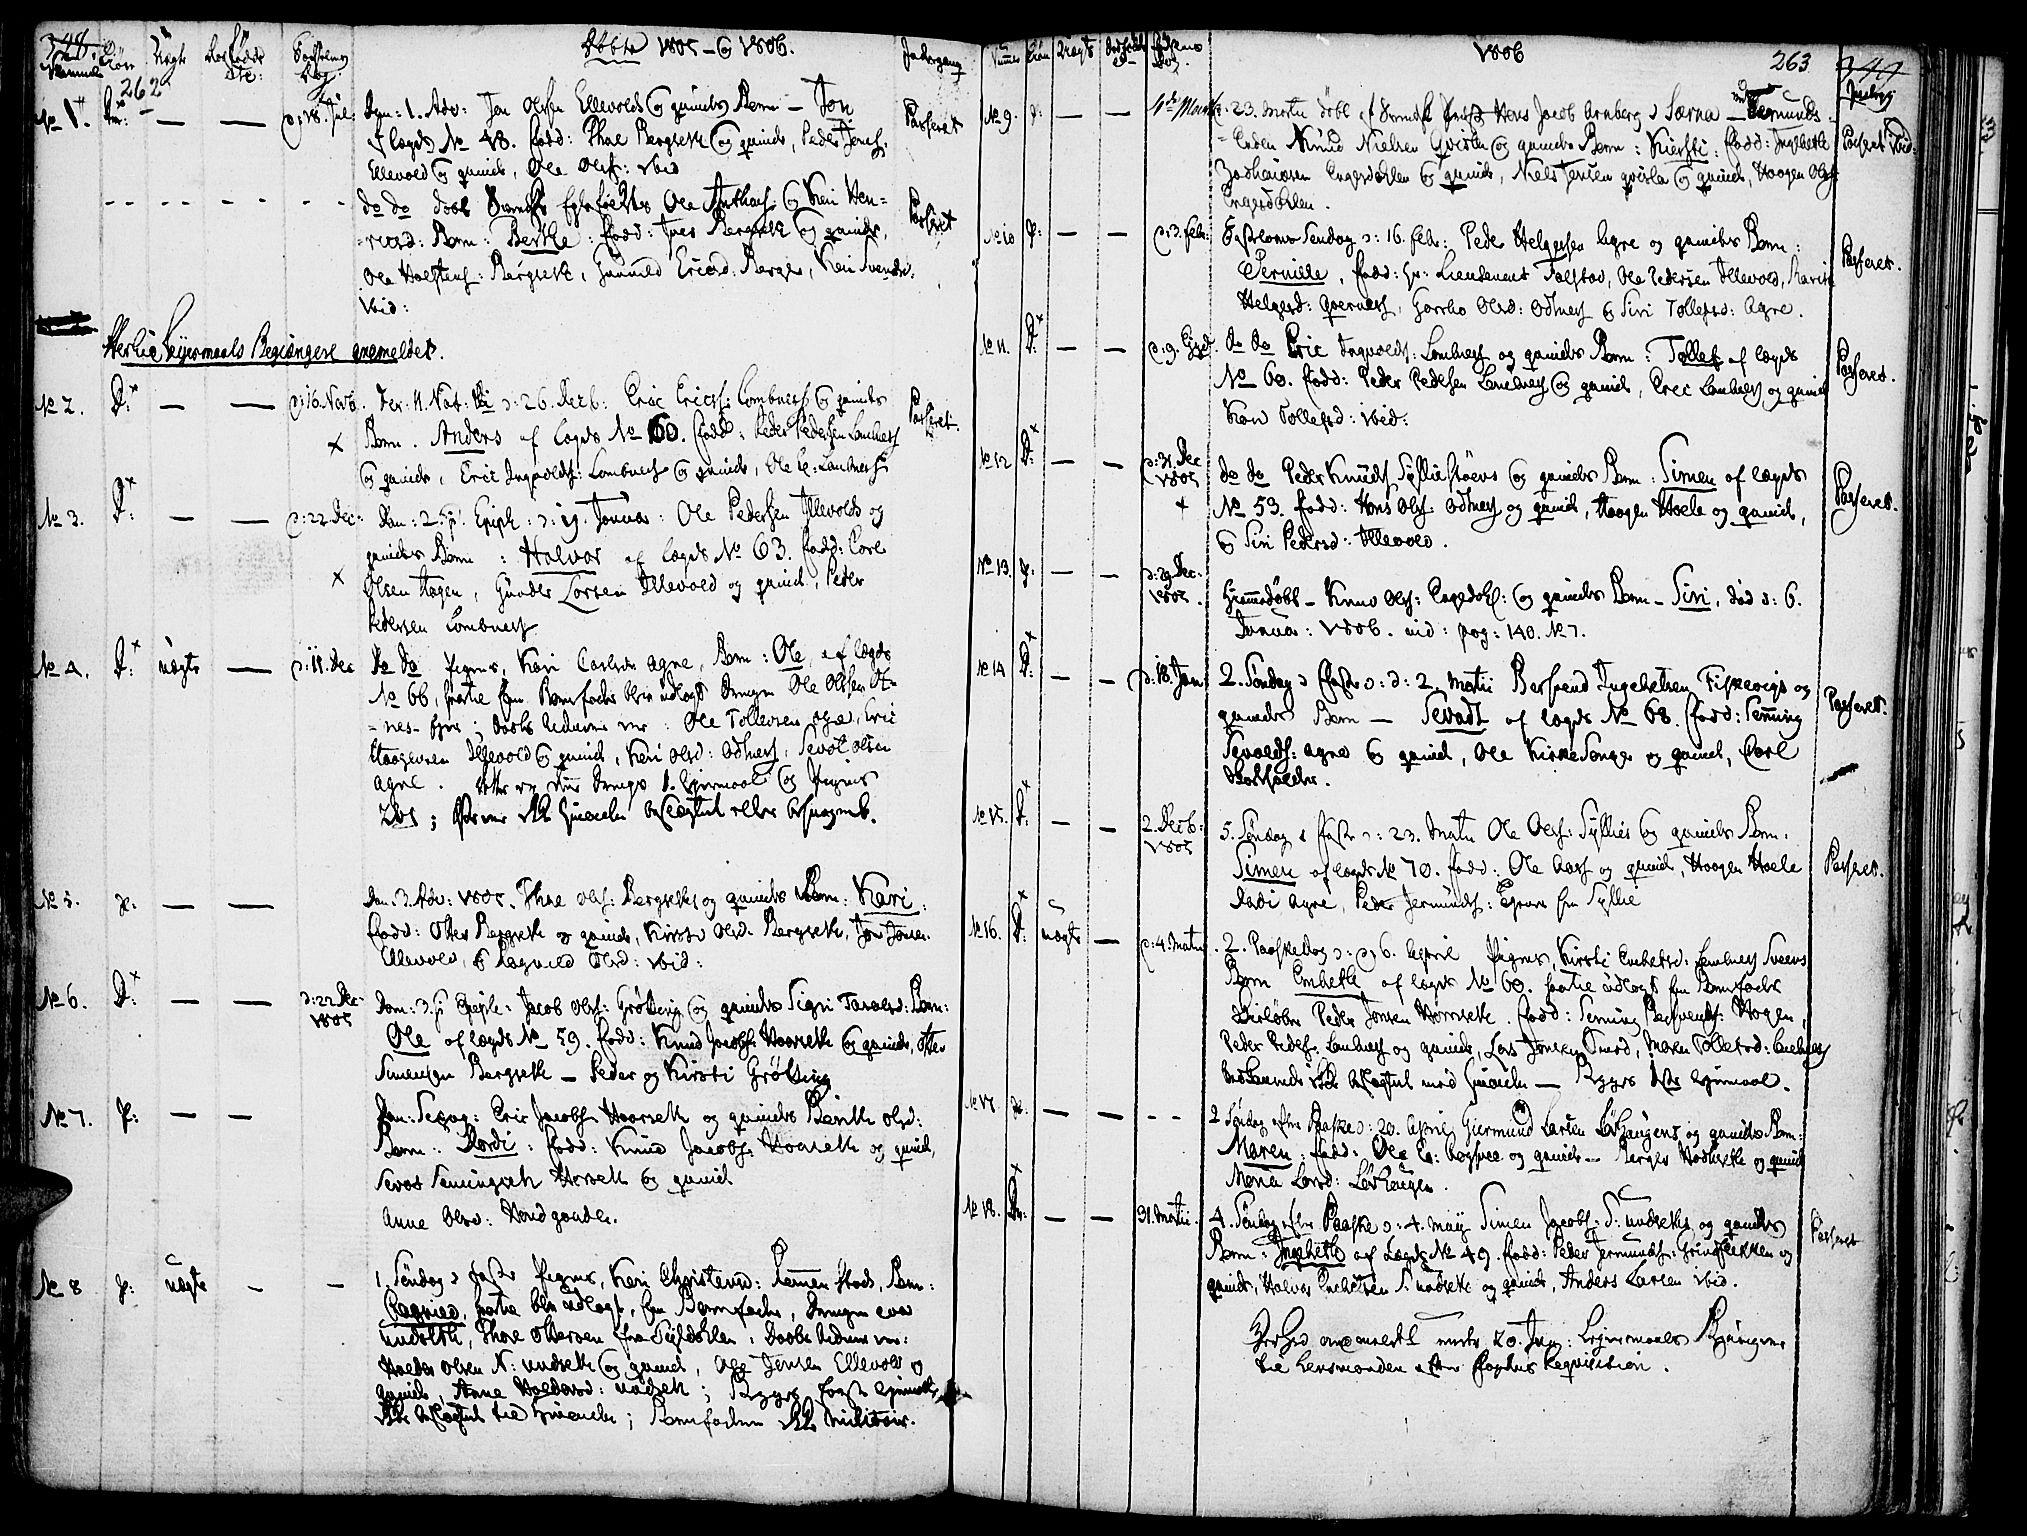 SAH, Rendalen prestekontor, H/Ha/Haa/L0002: Ministerialbok nr. 2, 1788-1814, s. 262-263